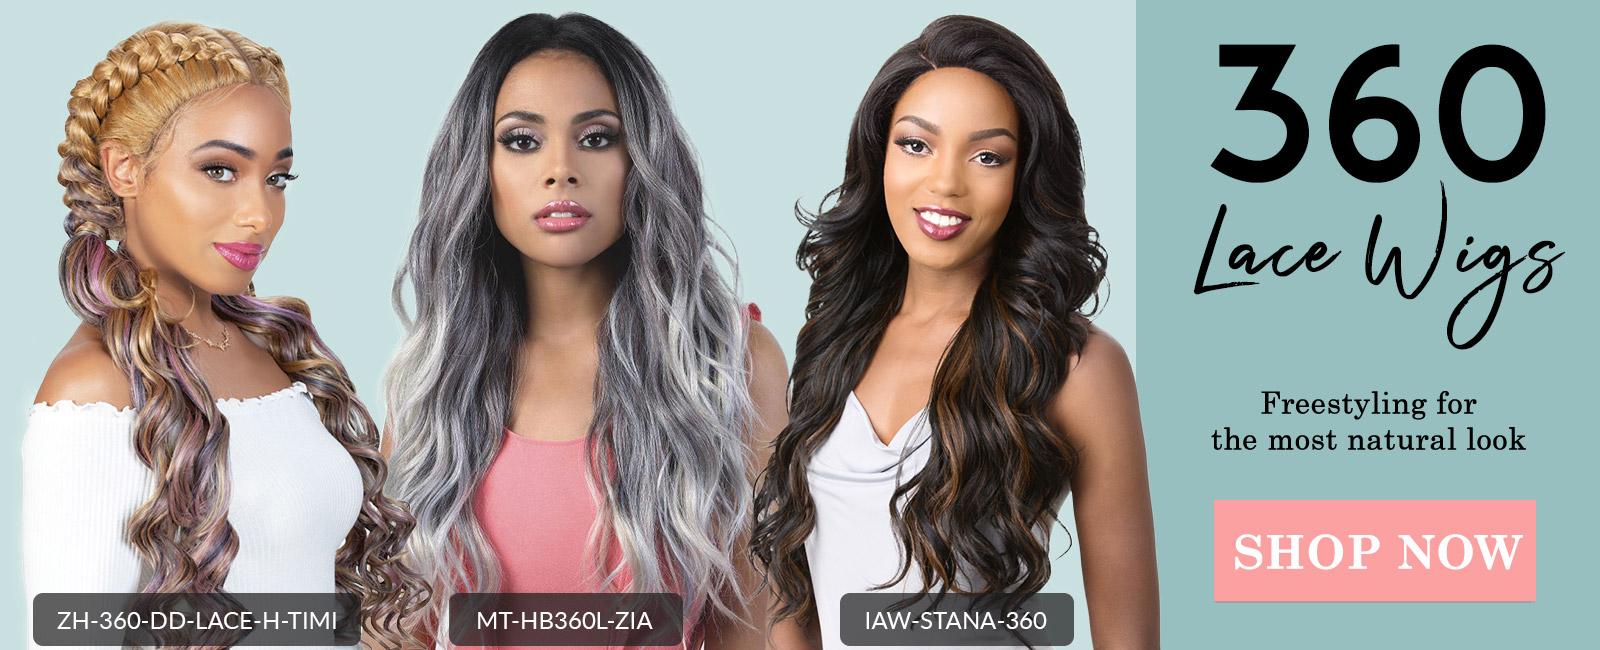 360-lace-wigs-mobile-v2